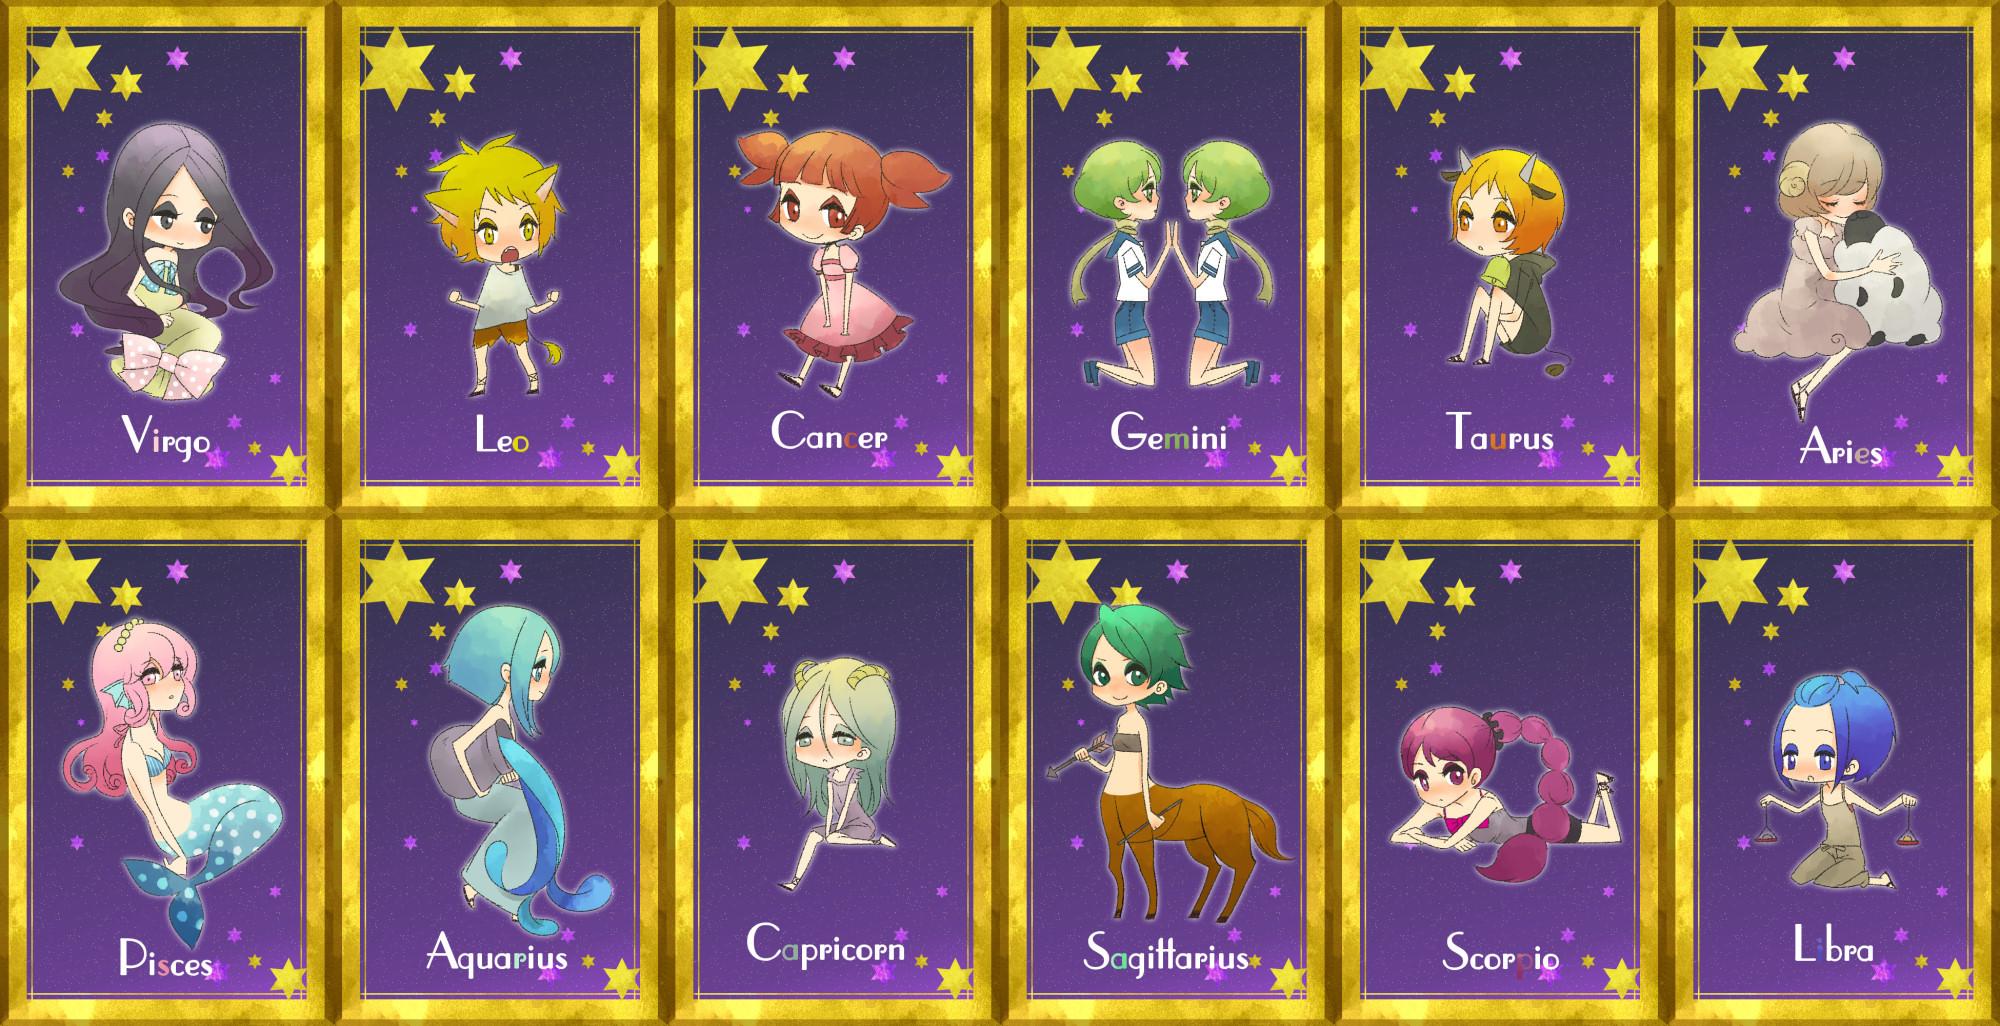 Anime Characters Zodiac Signs Libra : Zodiac wallpaper  zerochan anime image board